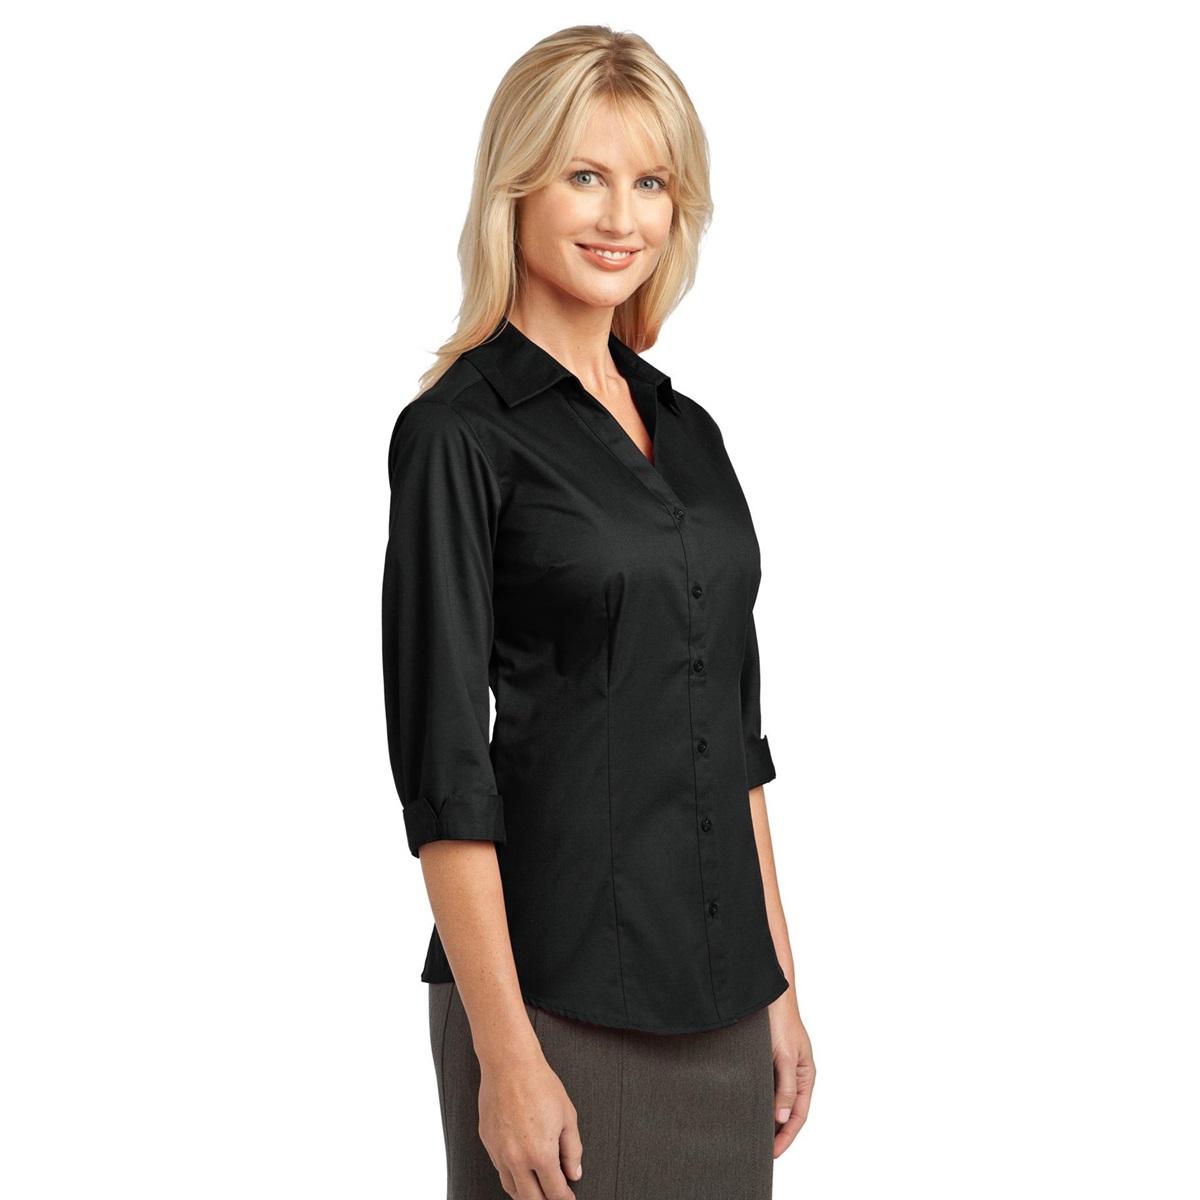 Ladies 3 4 sleeve blouse black dressy blouses for No iron white shirt womens